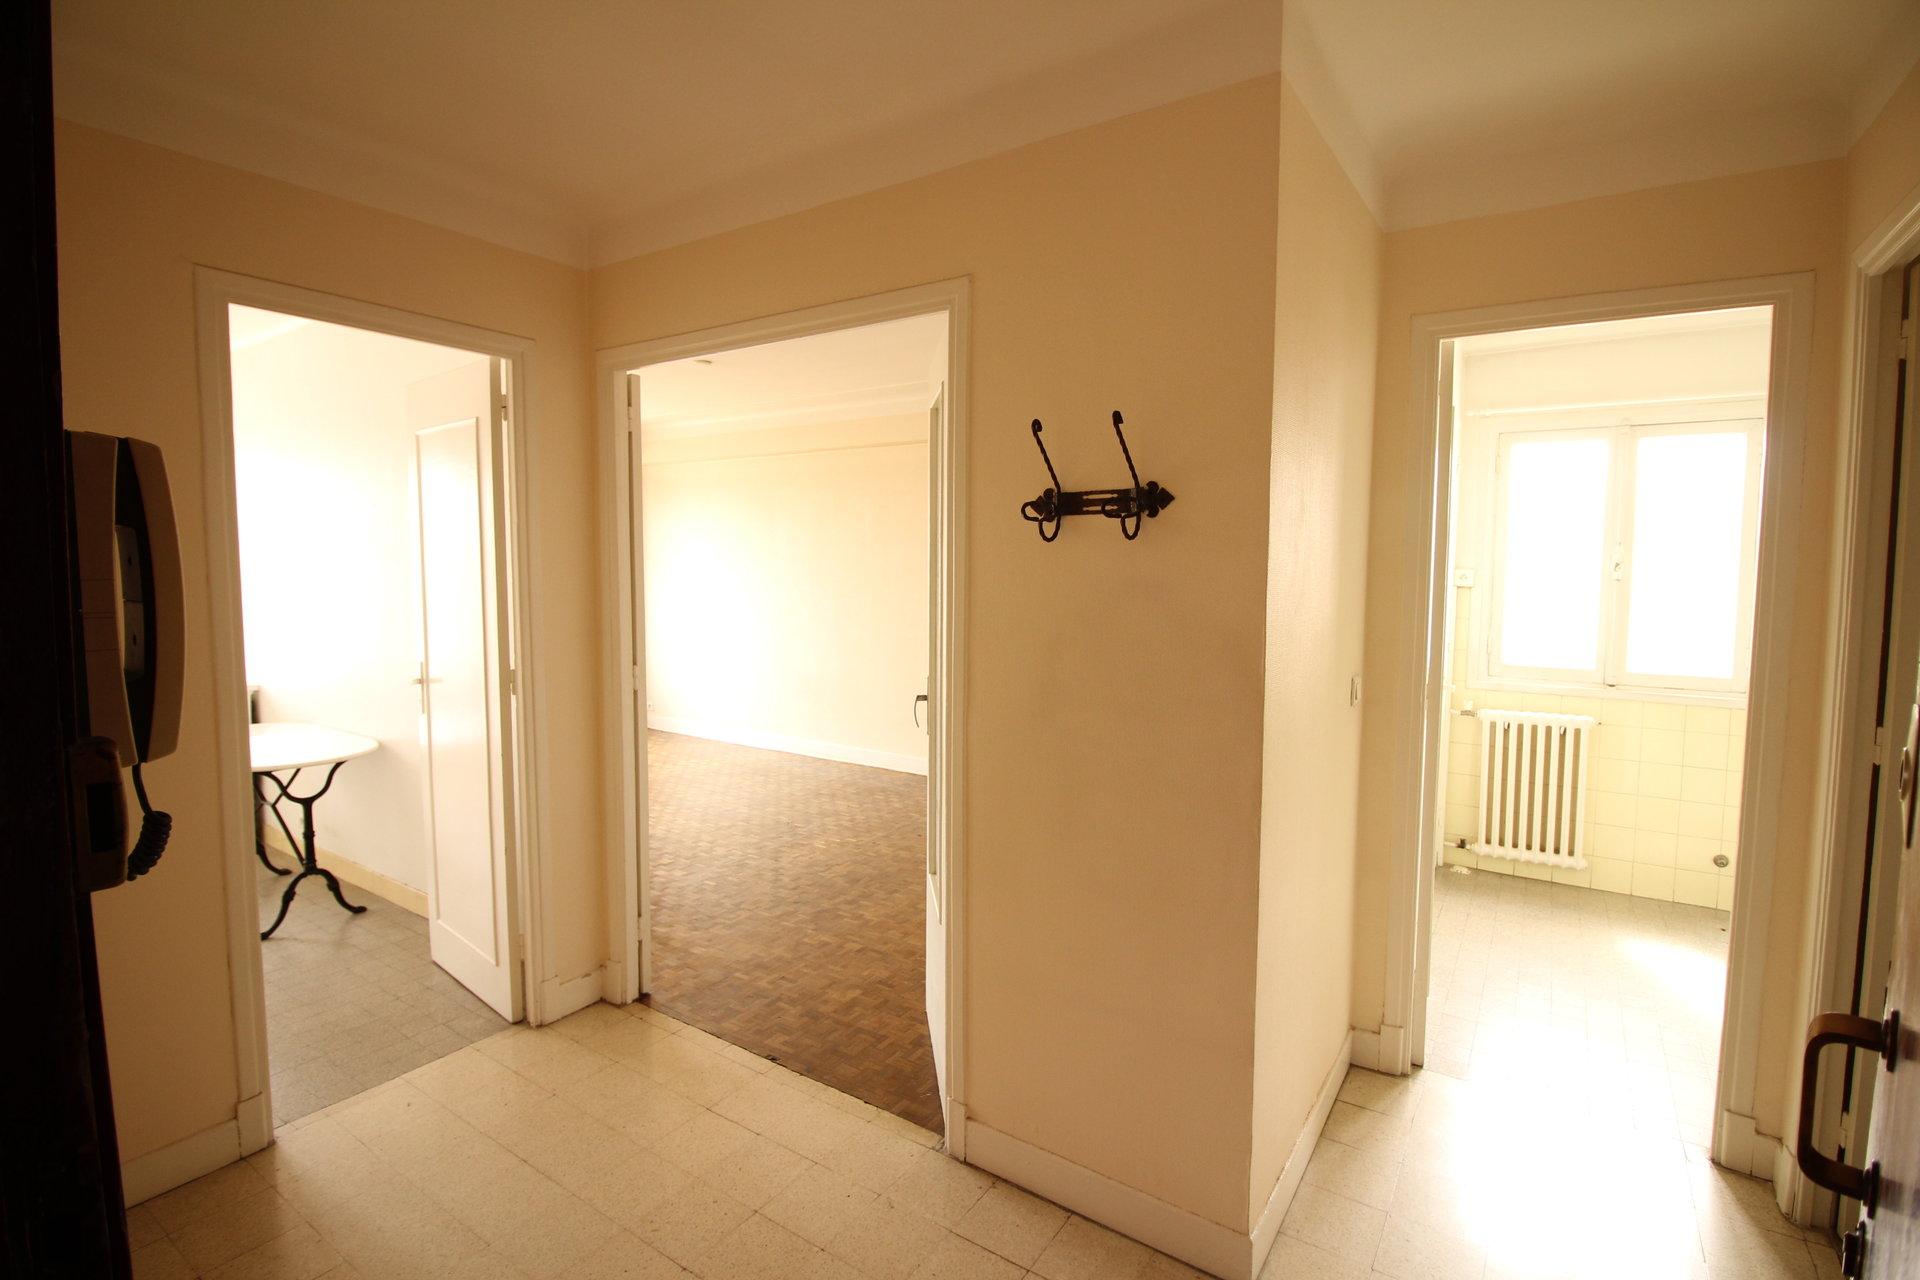 F1 Dernier étage, terrasse, cave.